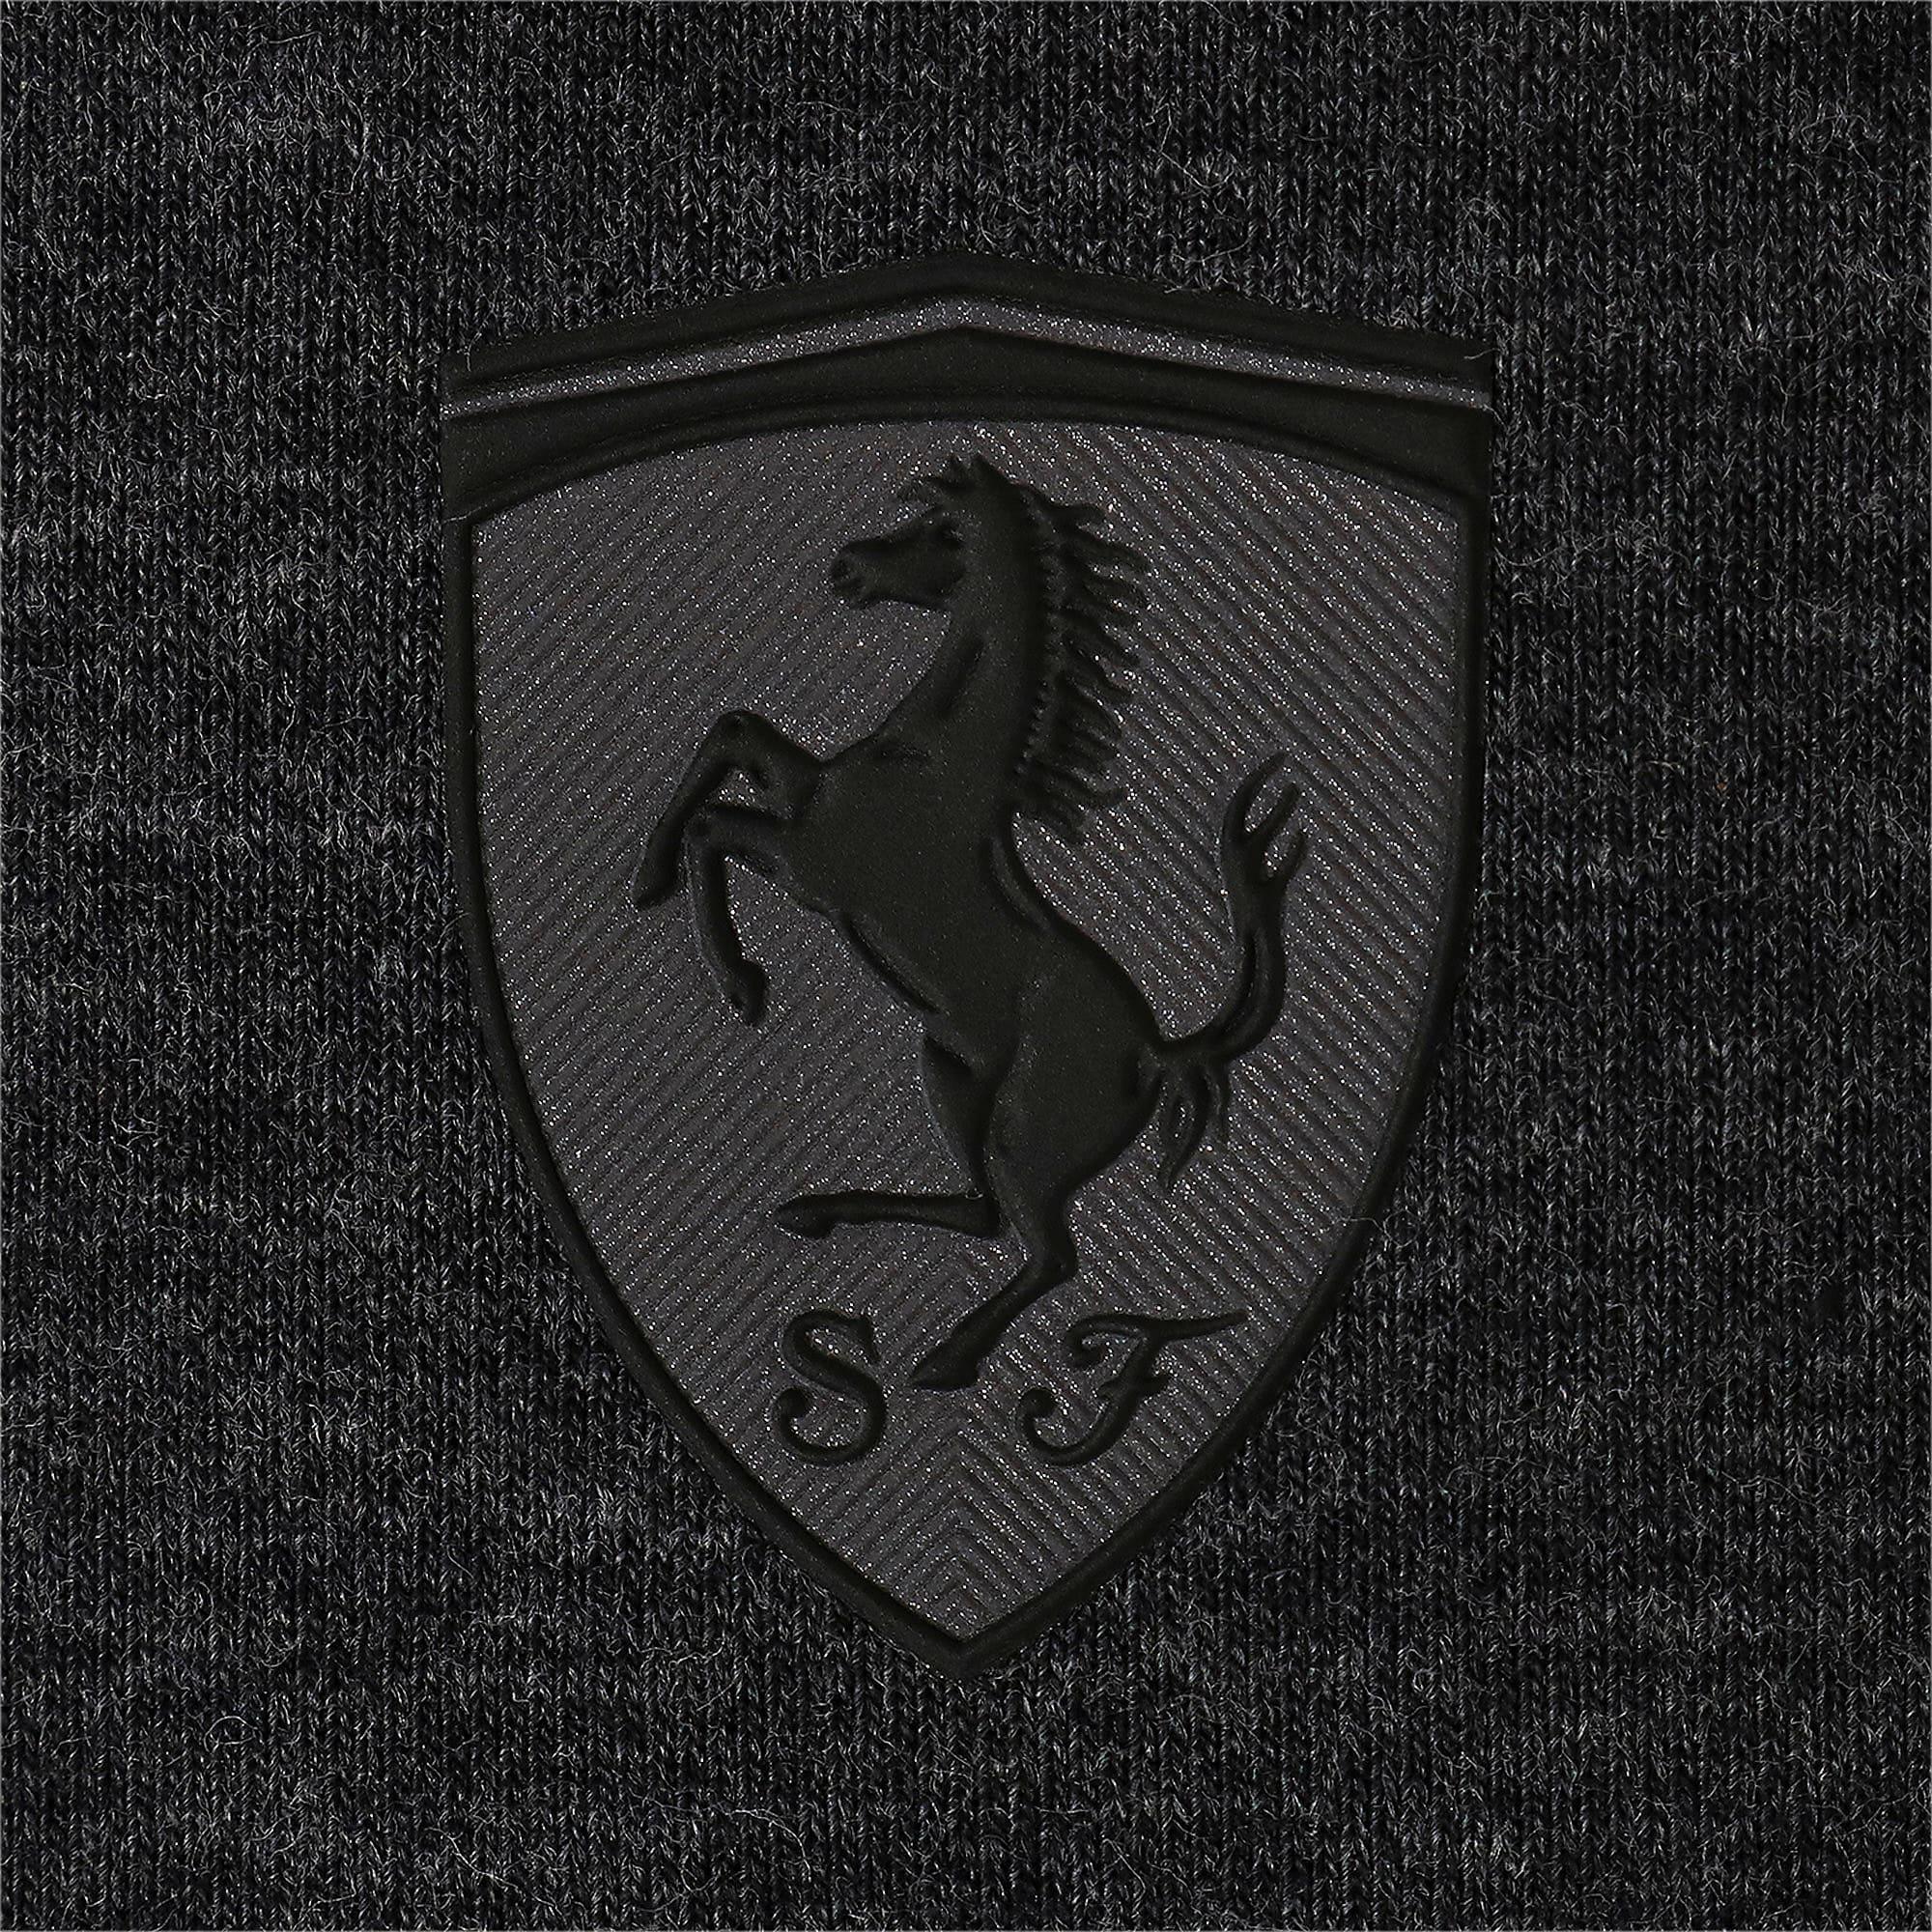 Thumbnail 8 of フェラーリ フーデッド スウェット ジャケット, Dark Gray Heather, medium-JPN